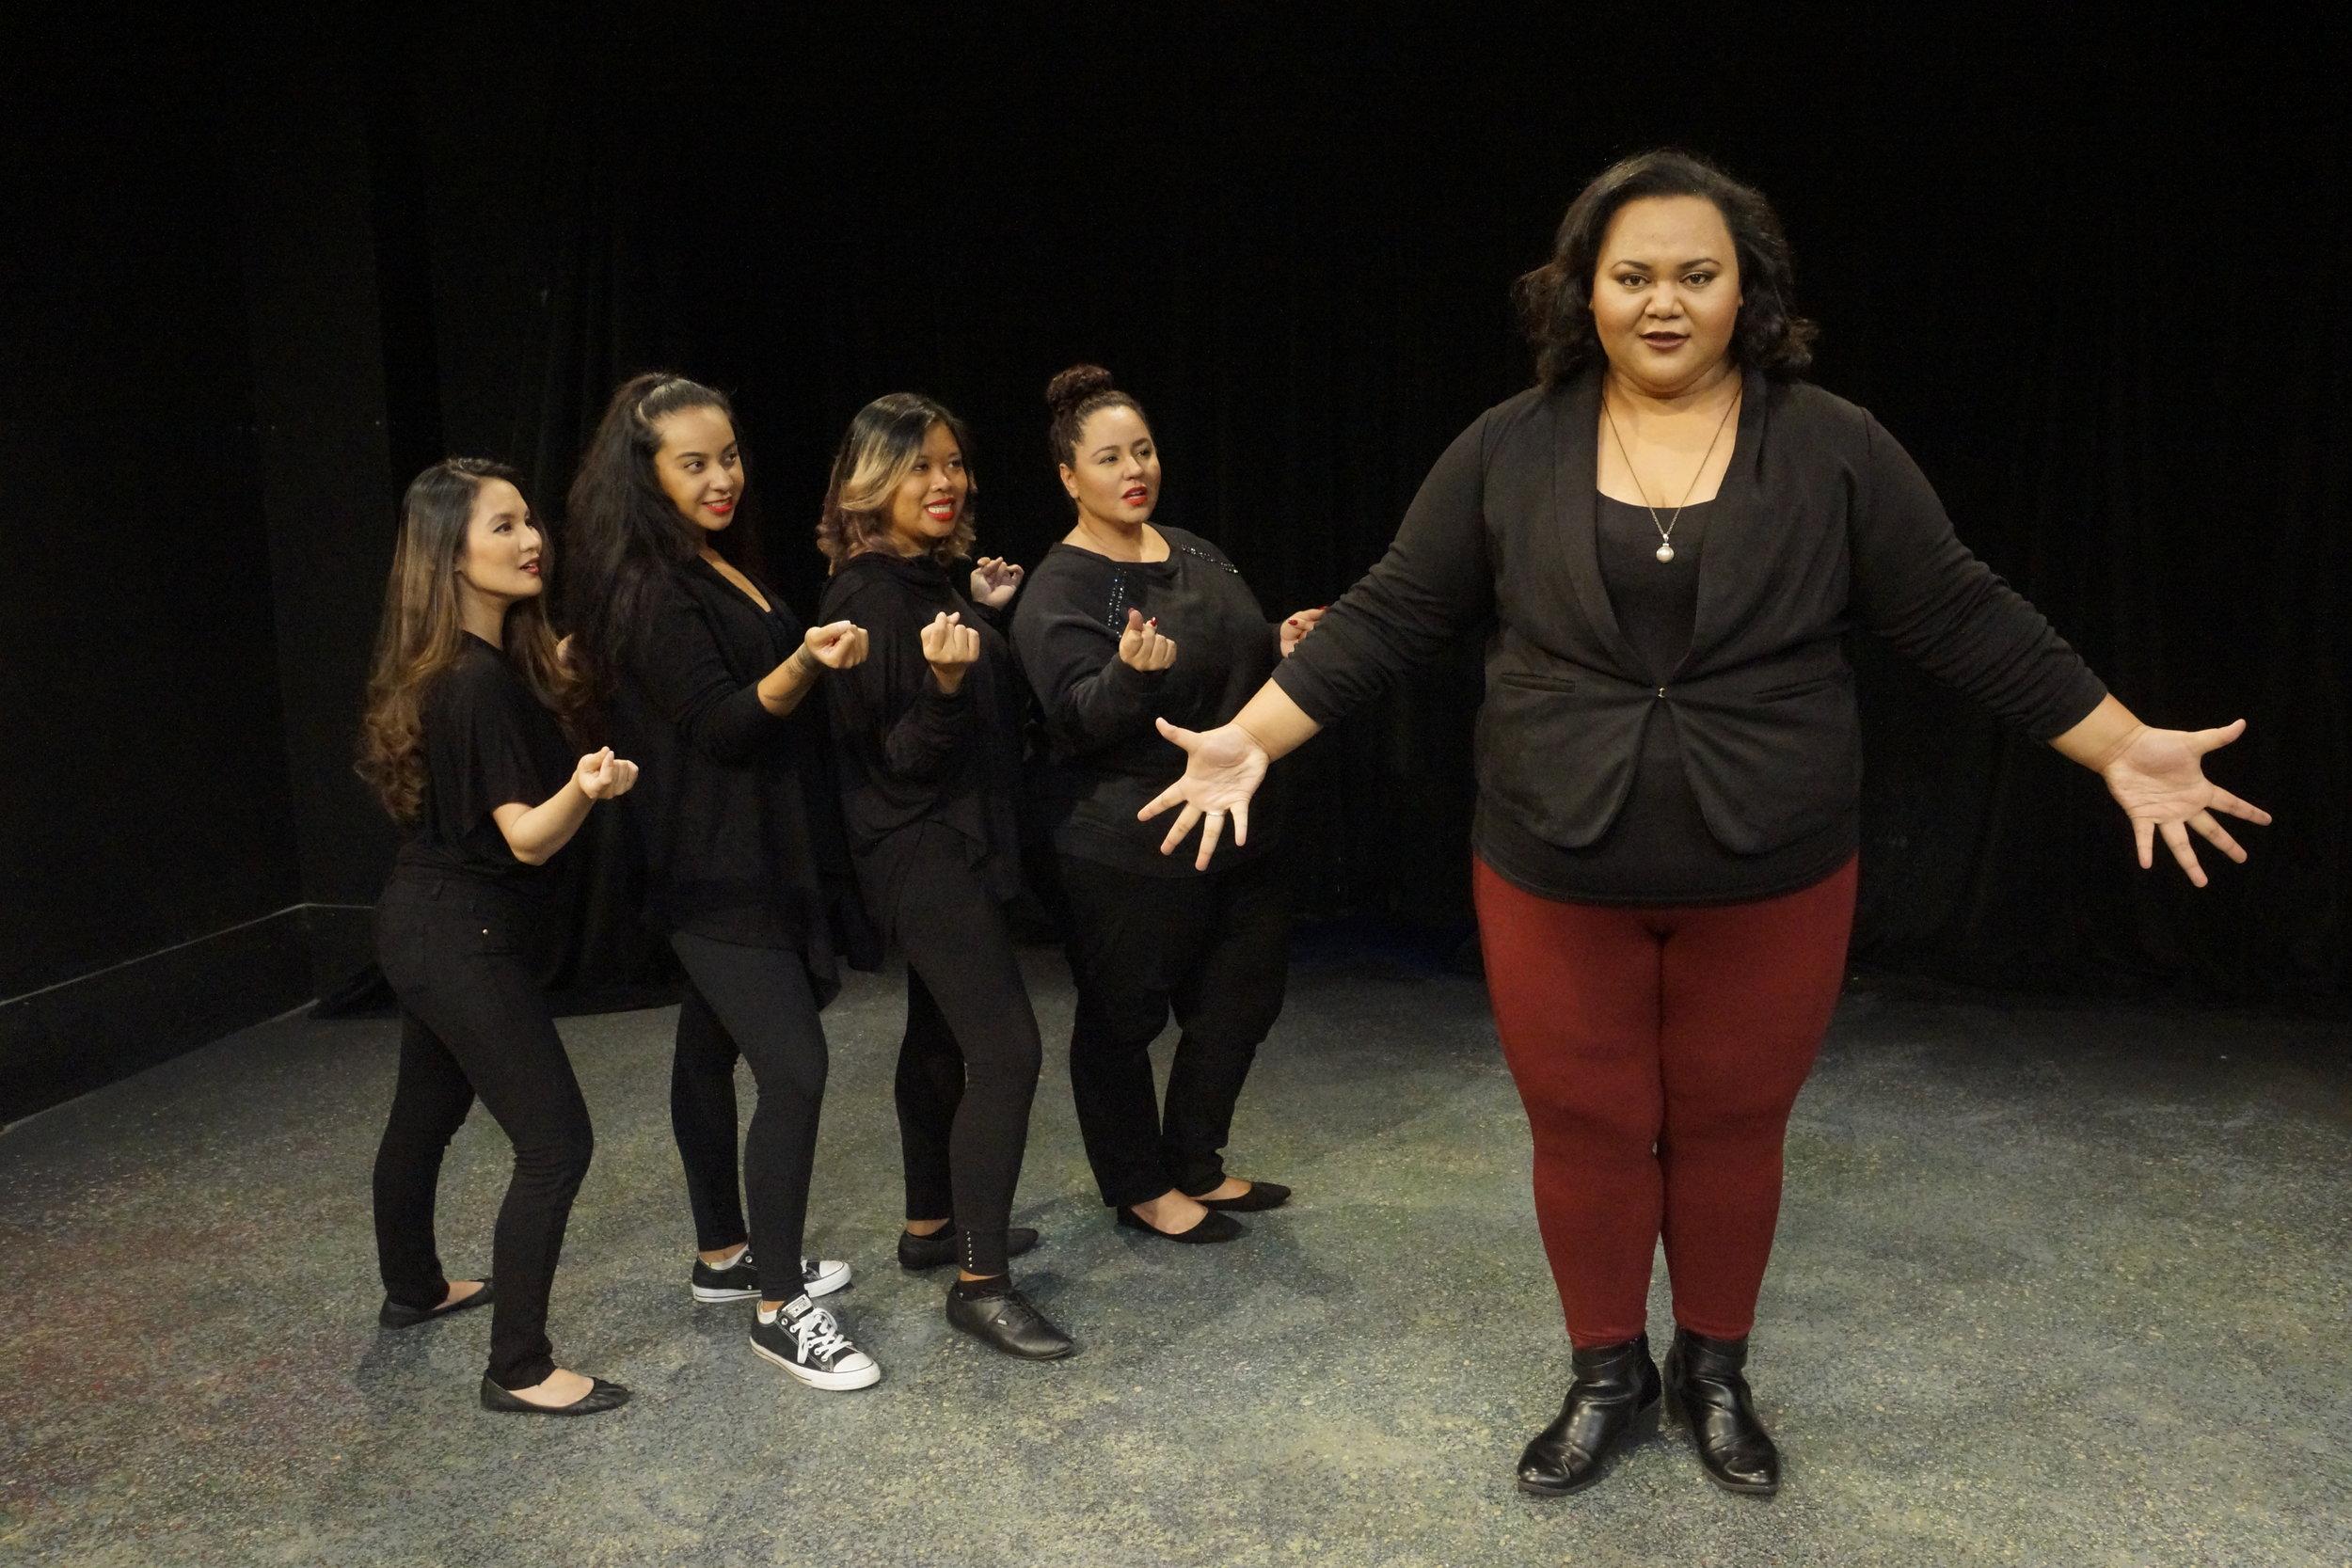 (l-r) Michelle Umipeg, Kalia Ongolea, Kristen Labiano, Kelli Pagan, and Leleaʻe Kahalepuna-Wong in Kumu Kahua Theatre's 'Puzzy'.